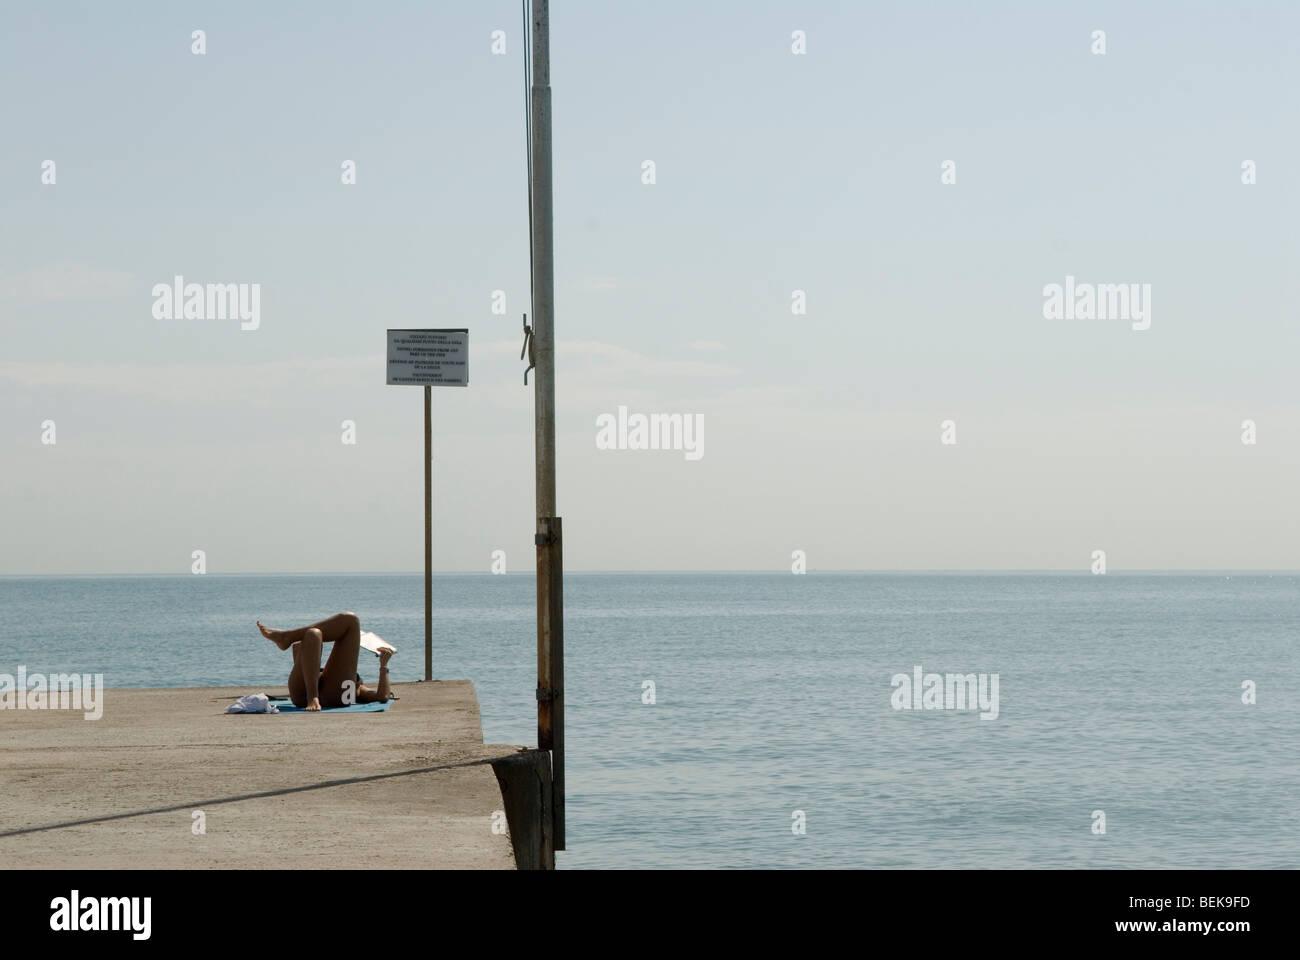 Venice Italy Venice Lido Adriatic sea the public beach. - Stock Image